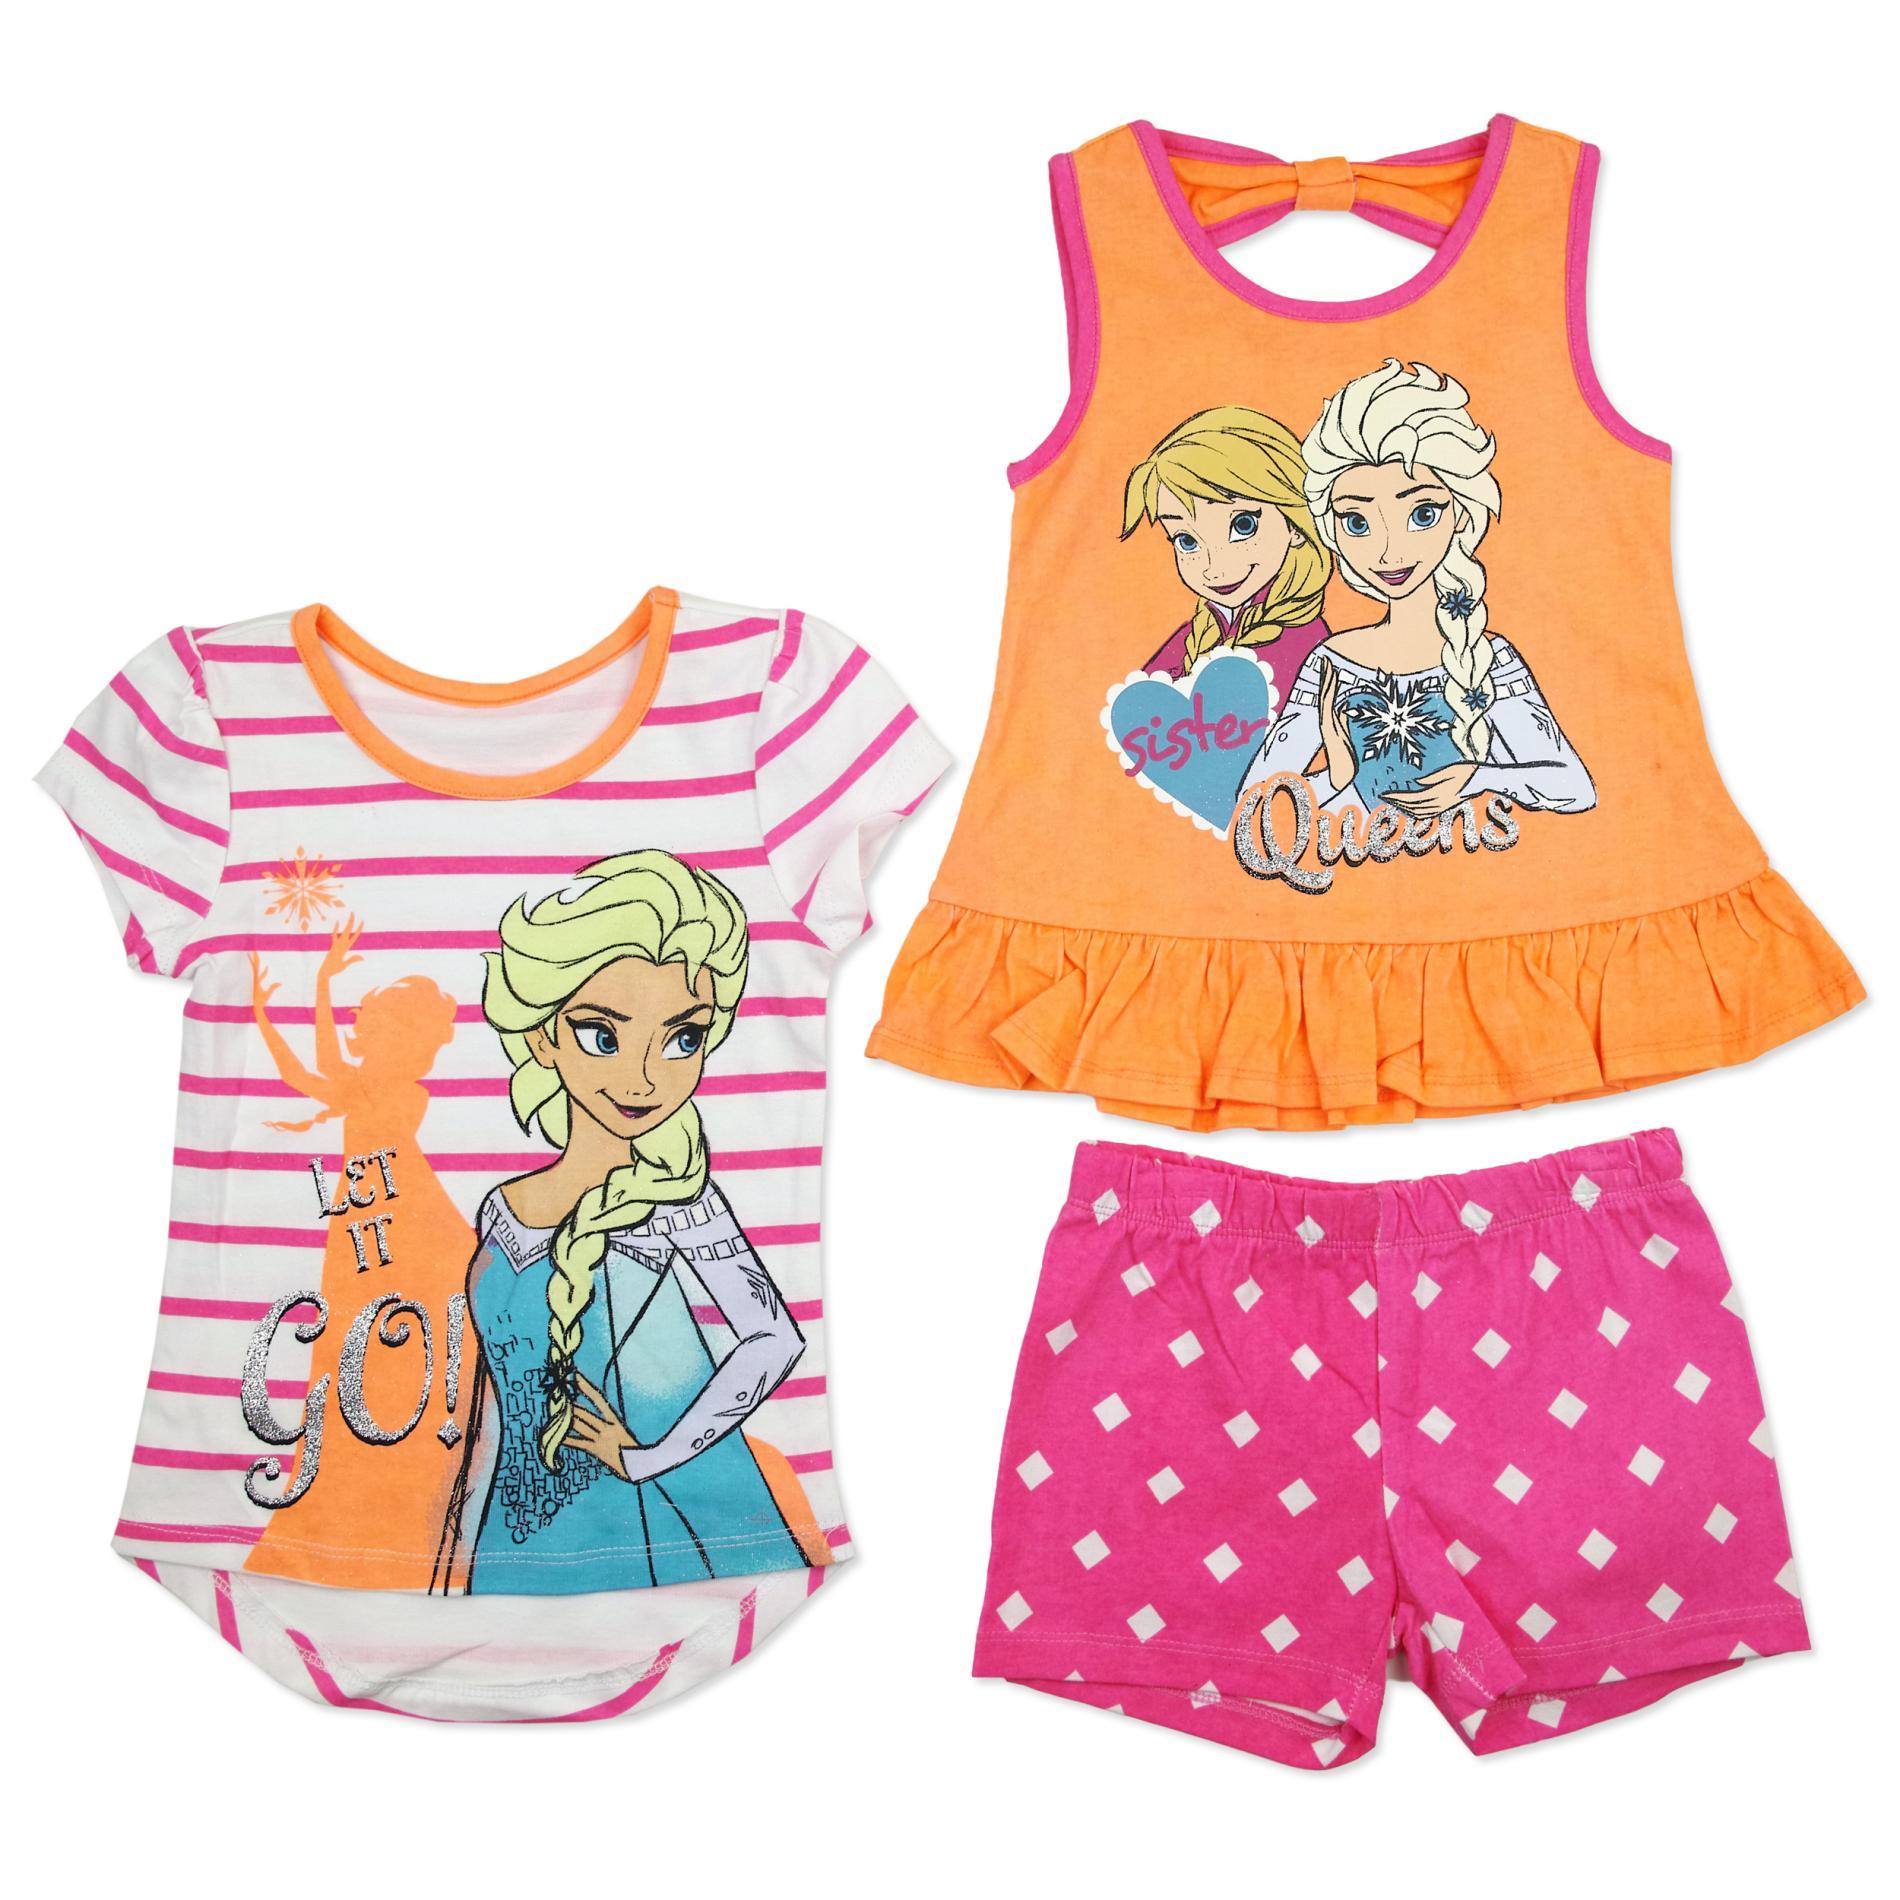 Disney Baby Frozen Toddler Girl's T-Shirt, Tank Top & Shorts